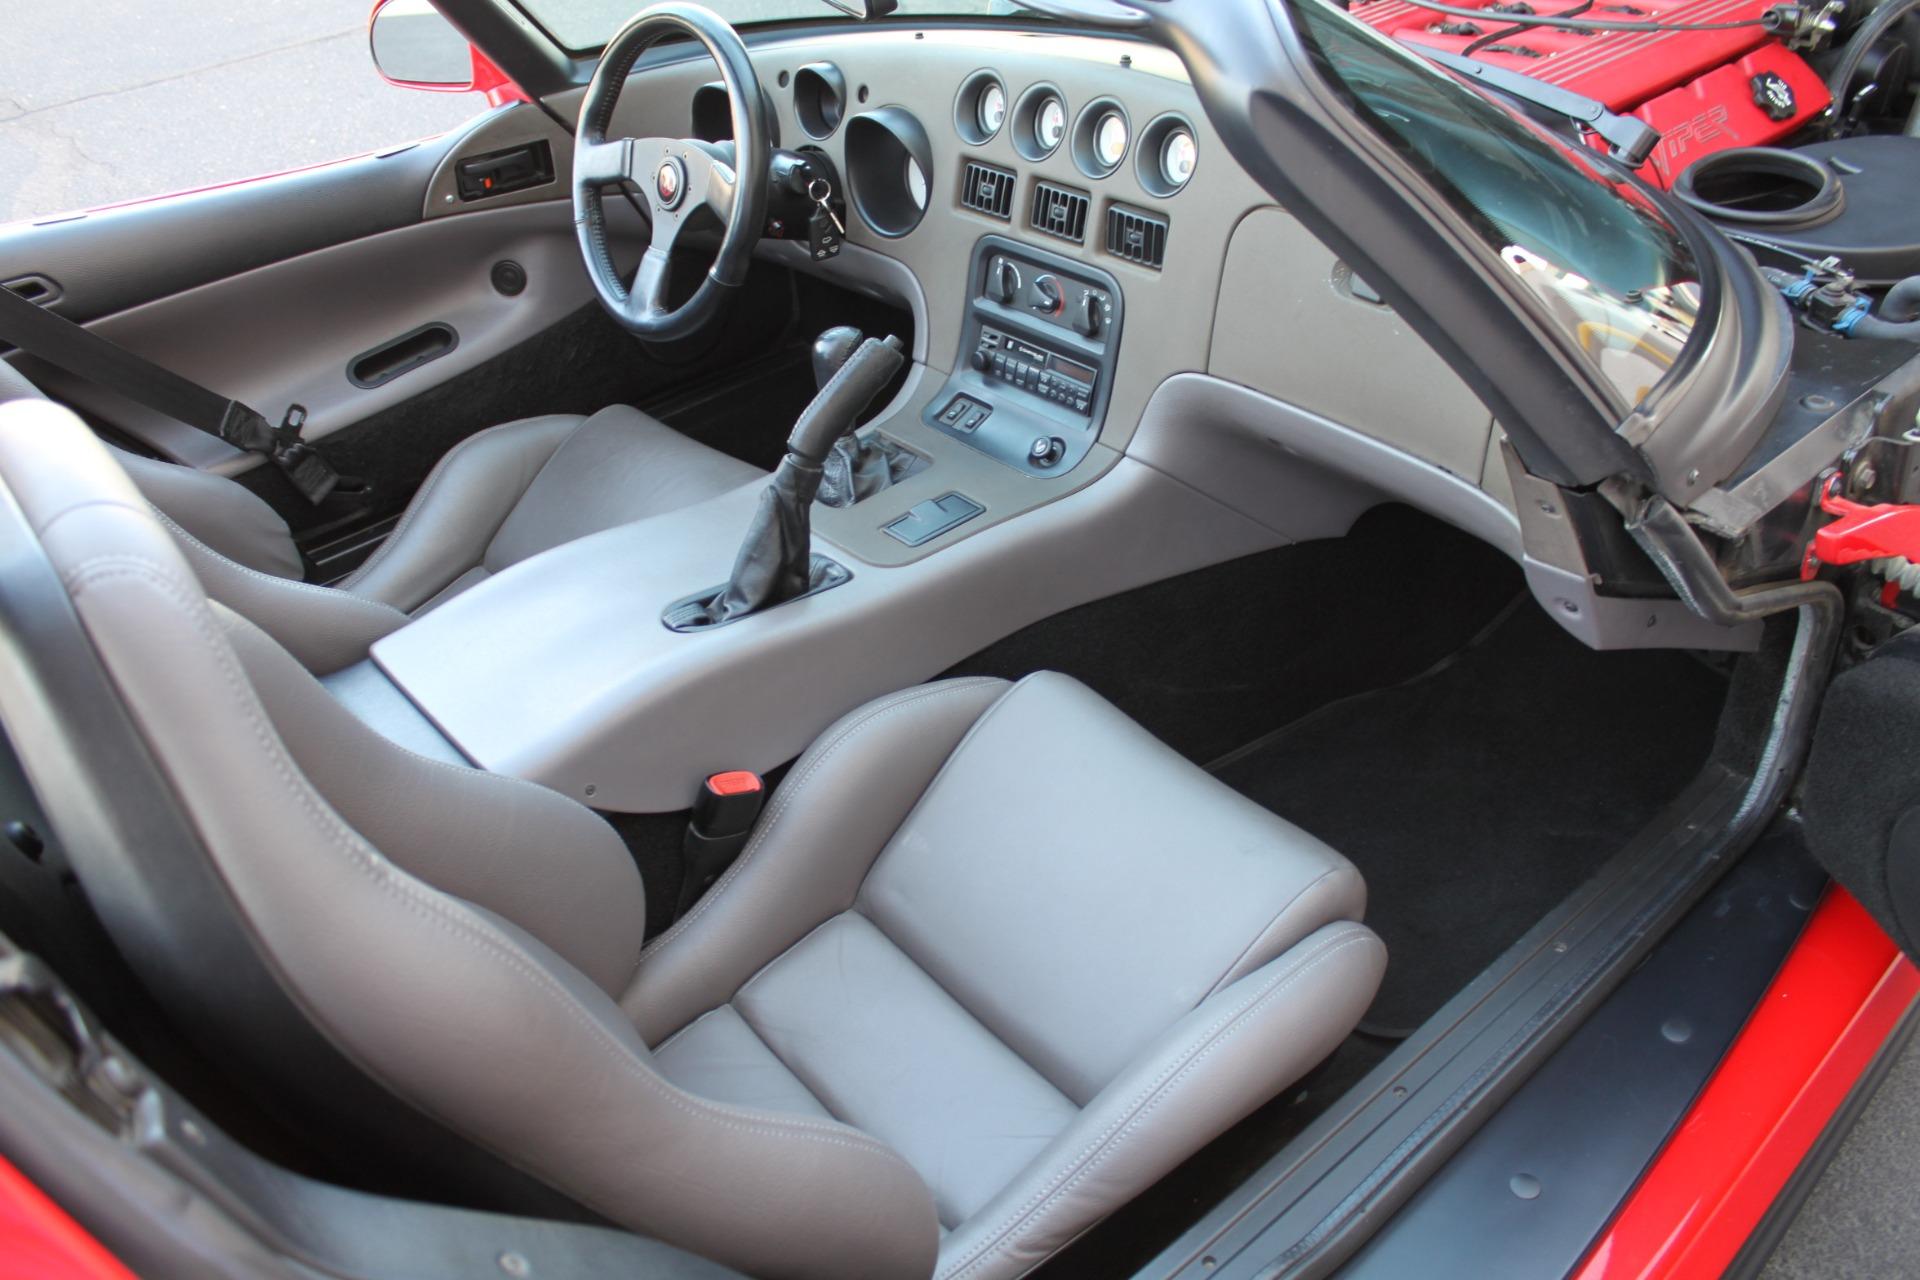 Used-1993-Dodge-Viper-Sports-Car-BMW